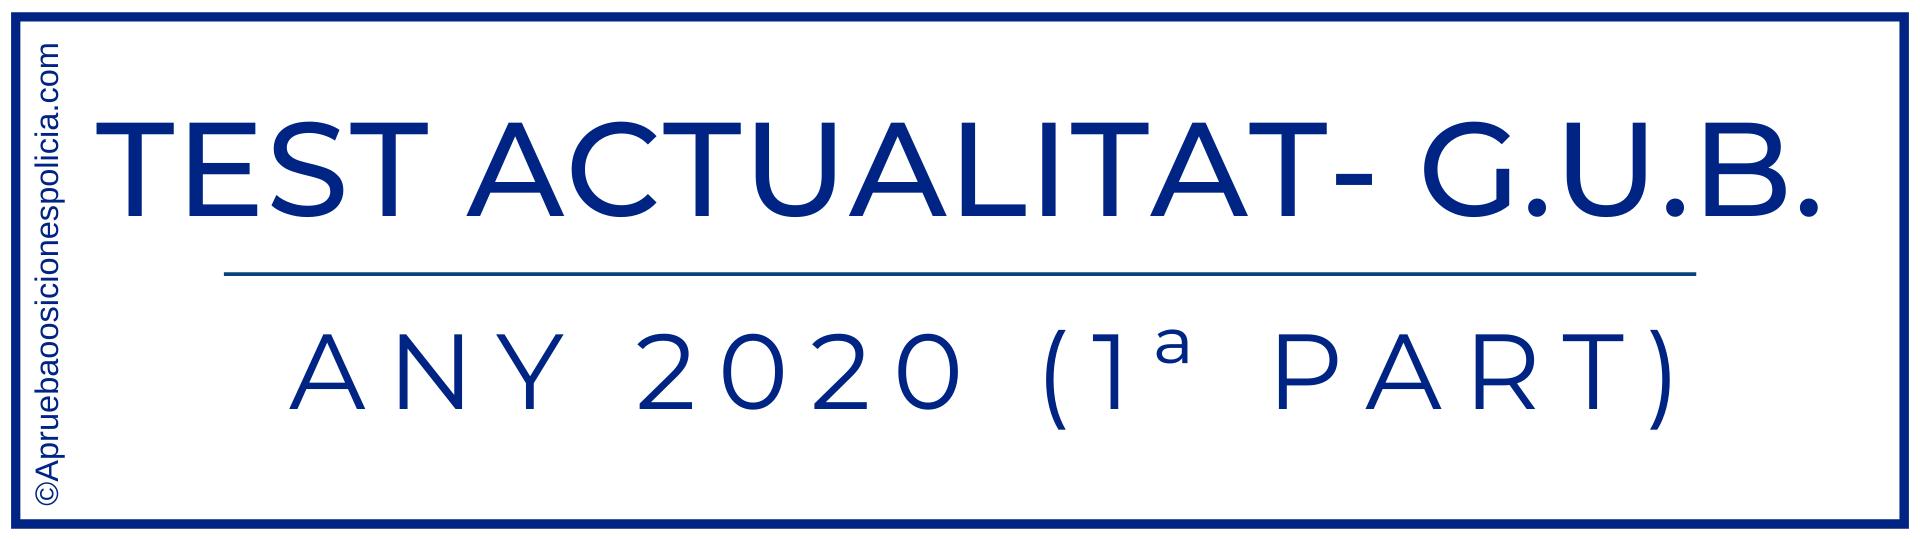 Test actualidad Gubarcelona 2020